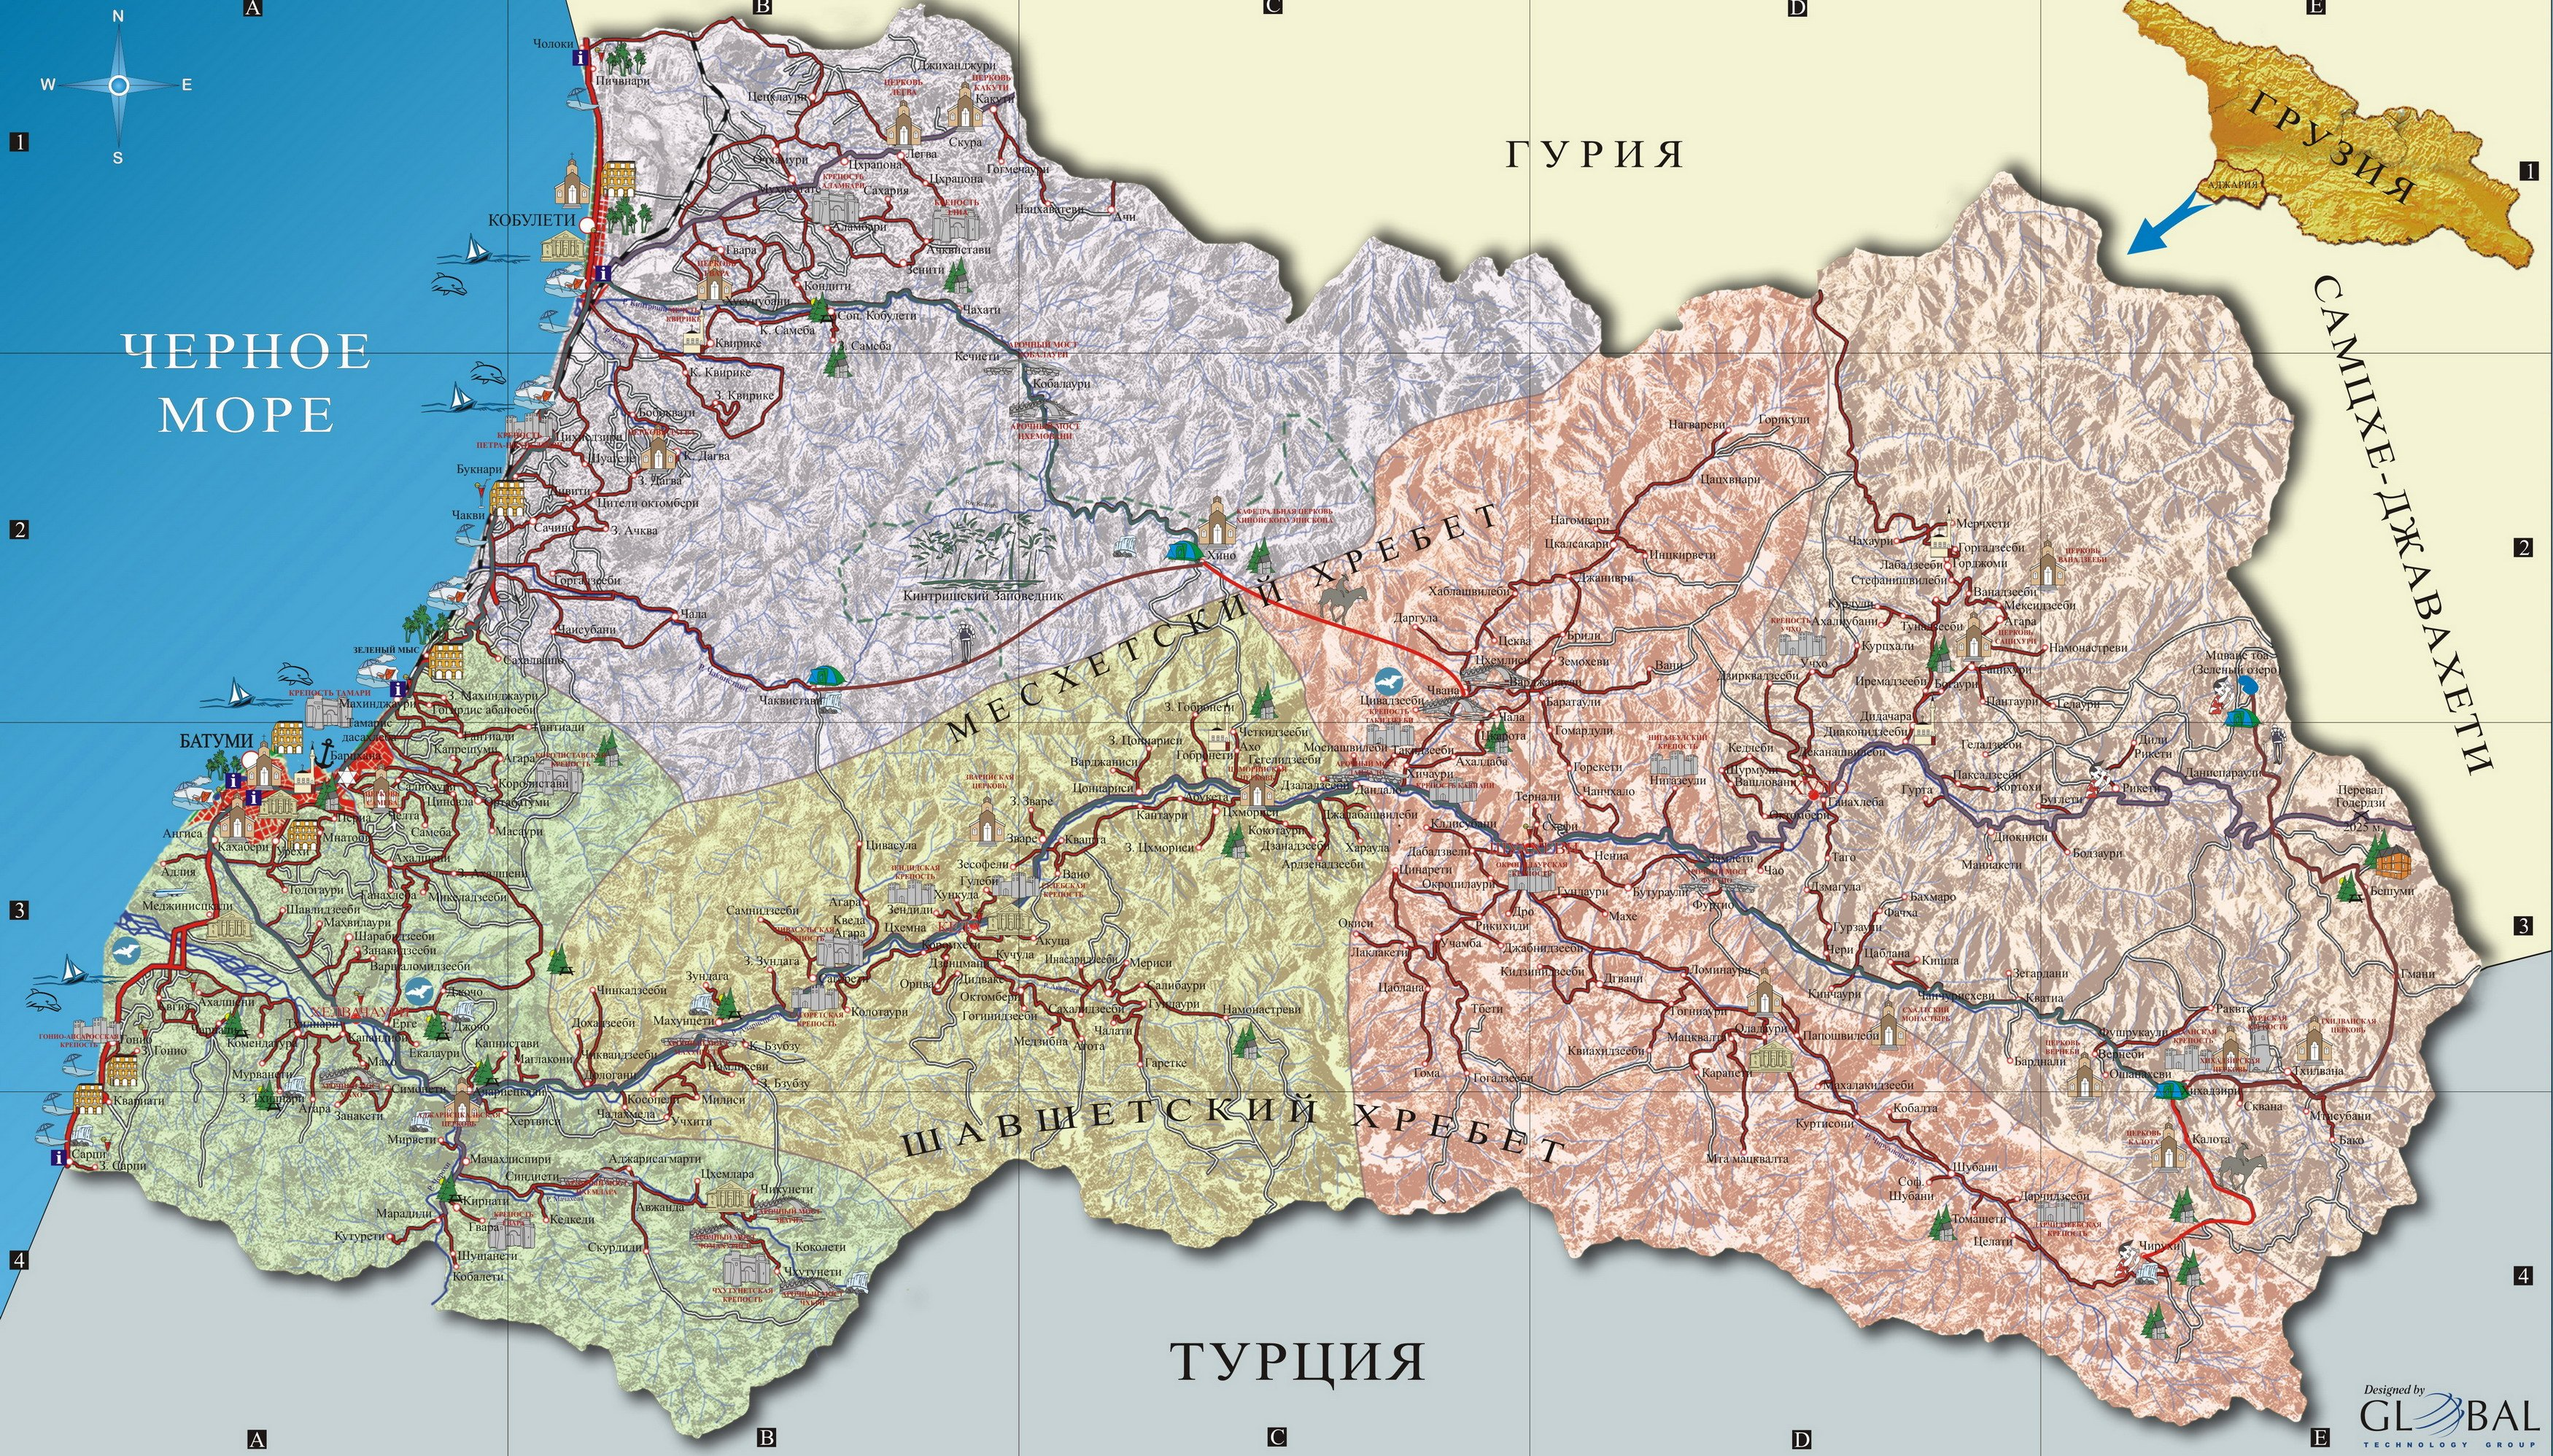 Karty Gruzii Podrobnaya Karta Gruzii Na Russkom Yazyke S Kurortami I